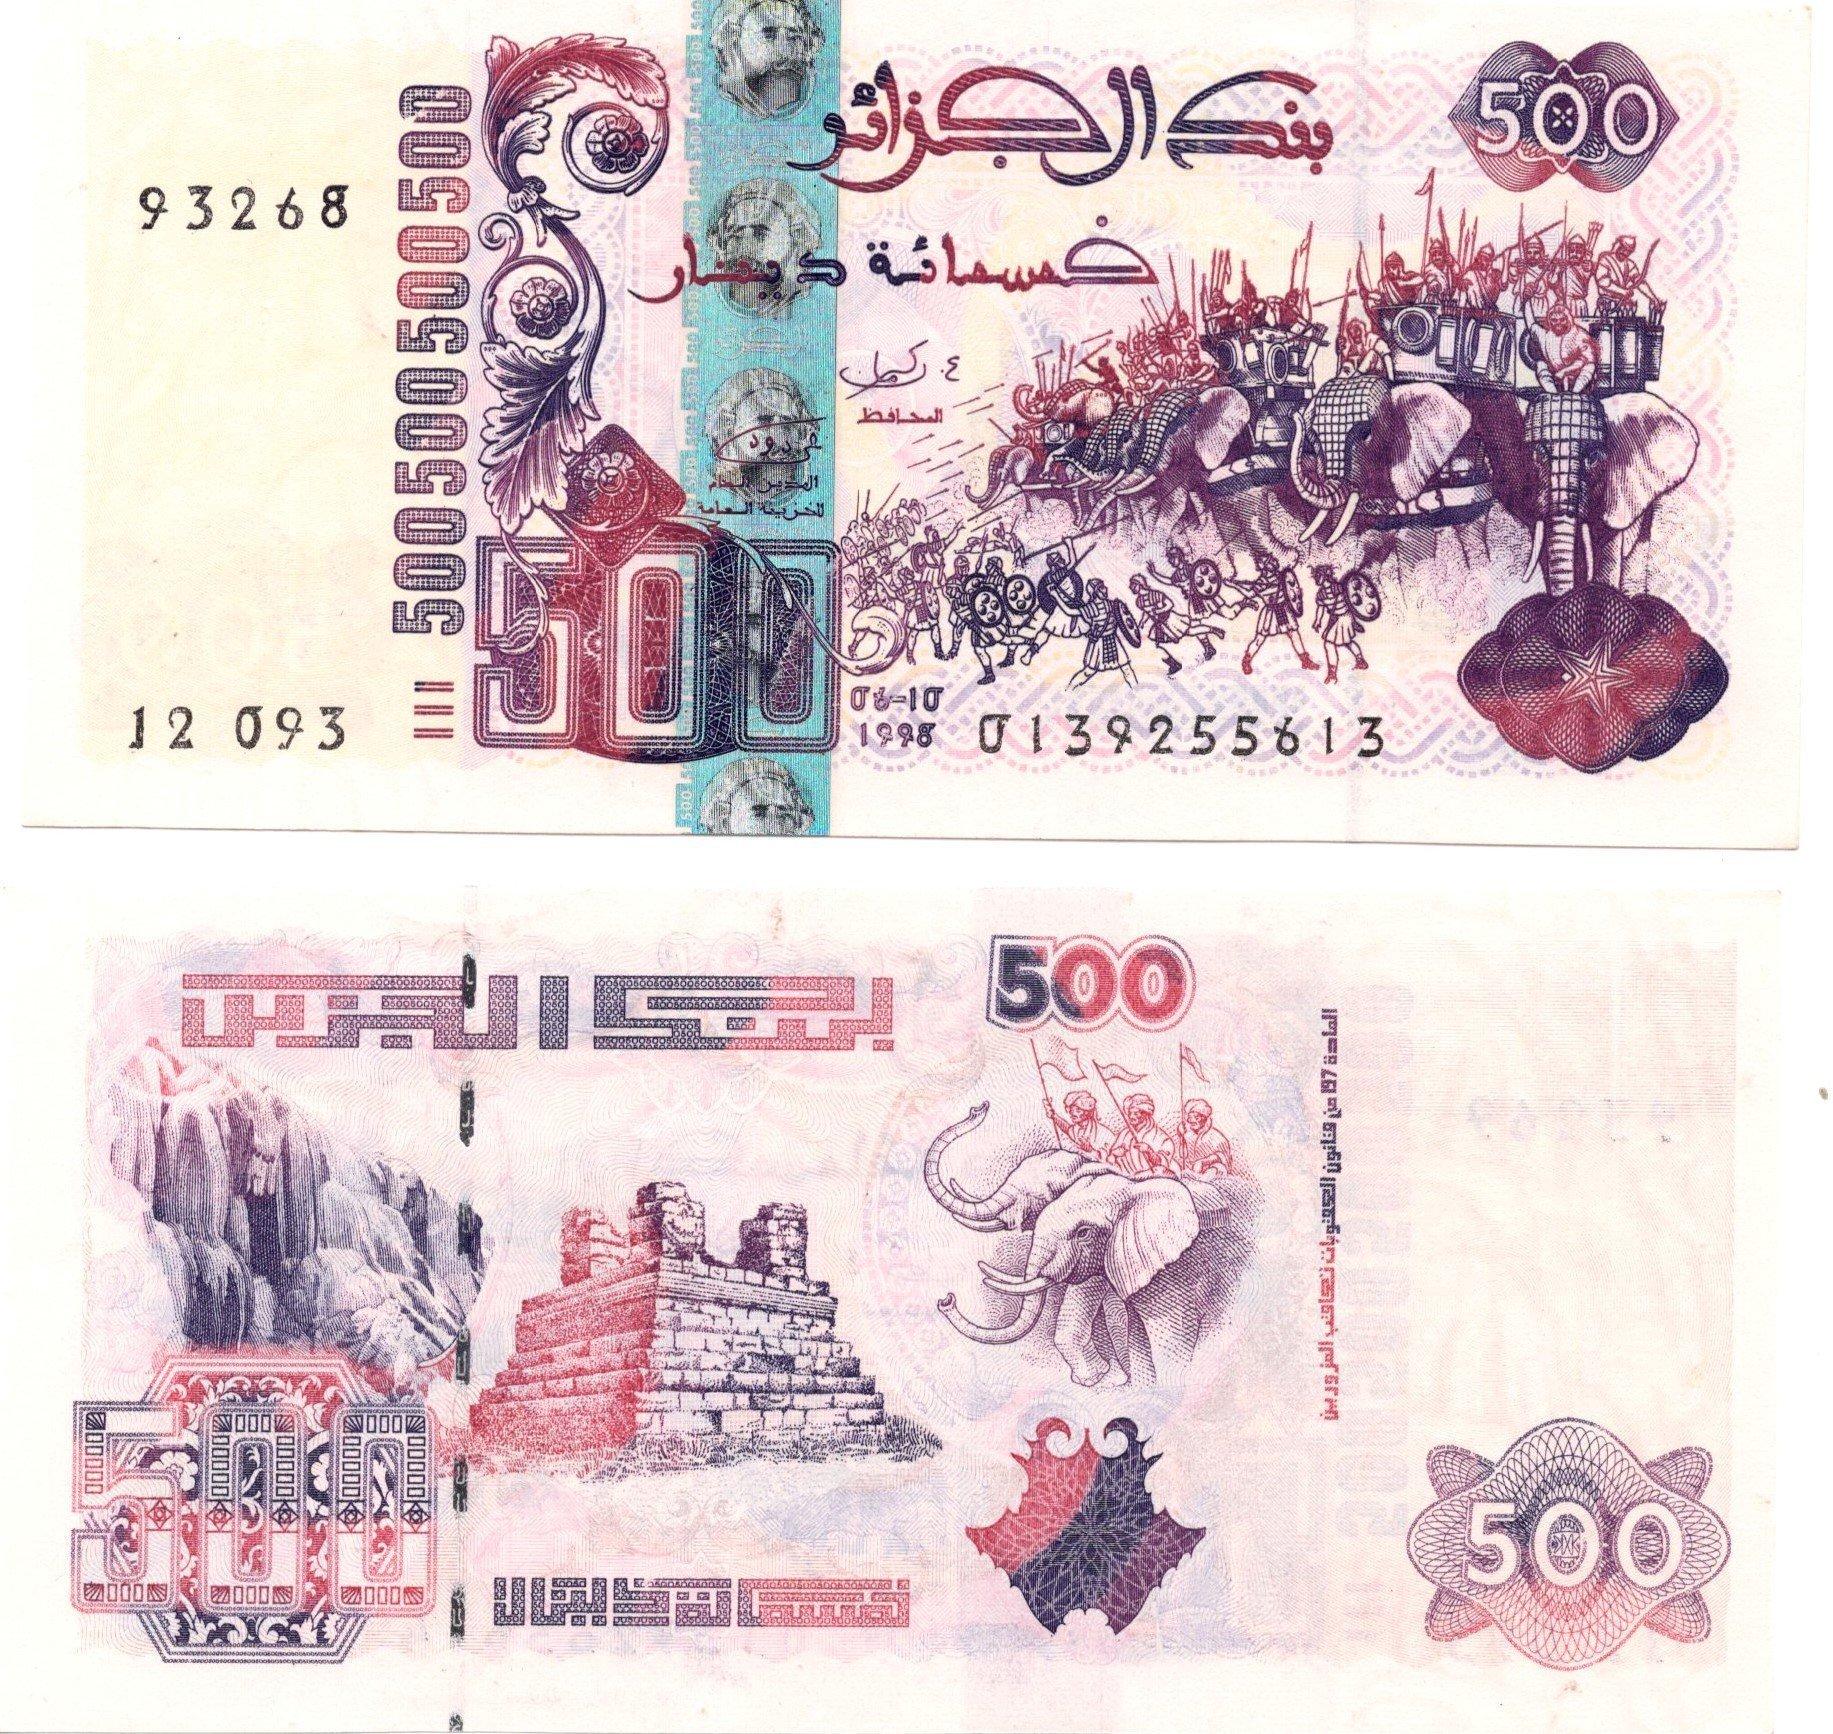 Algeria 500 dinars 1998 for sale